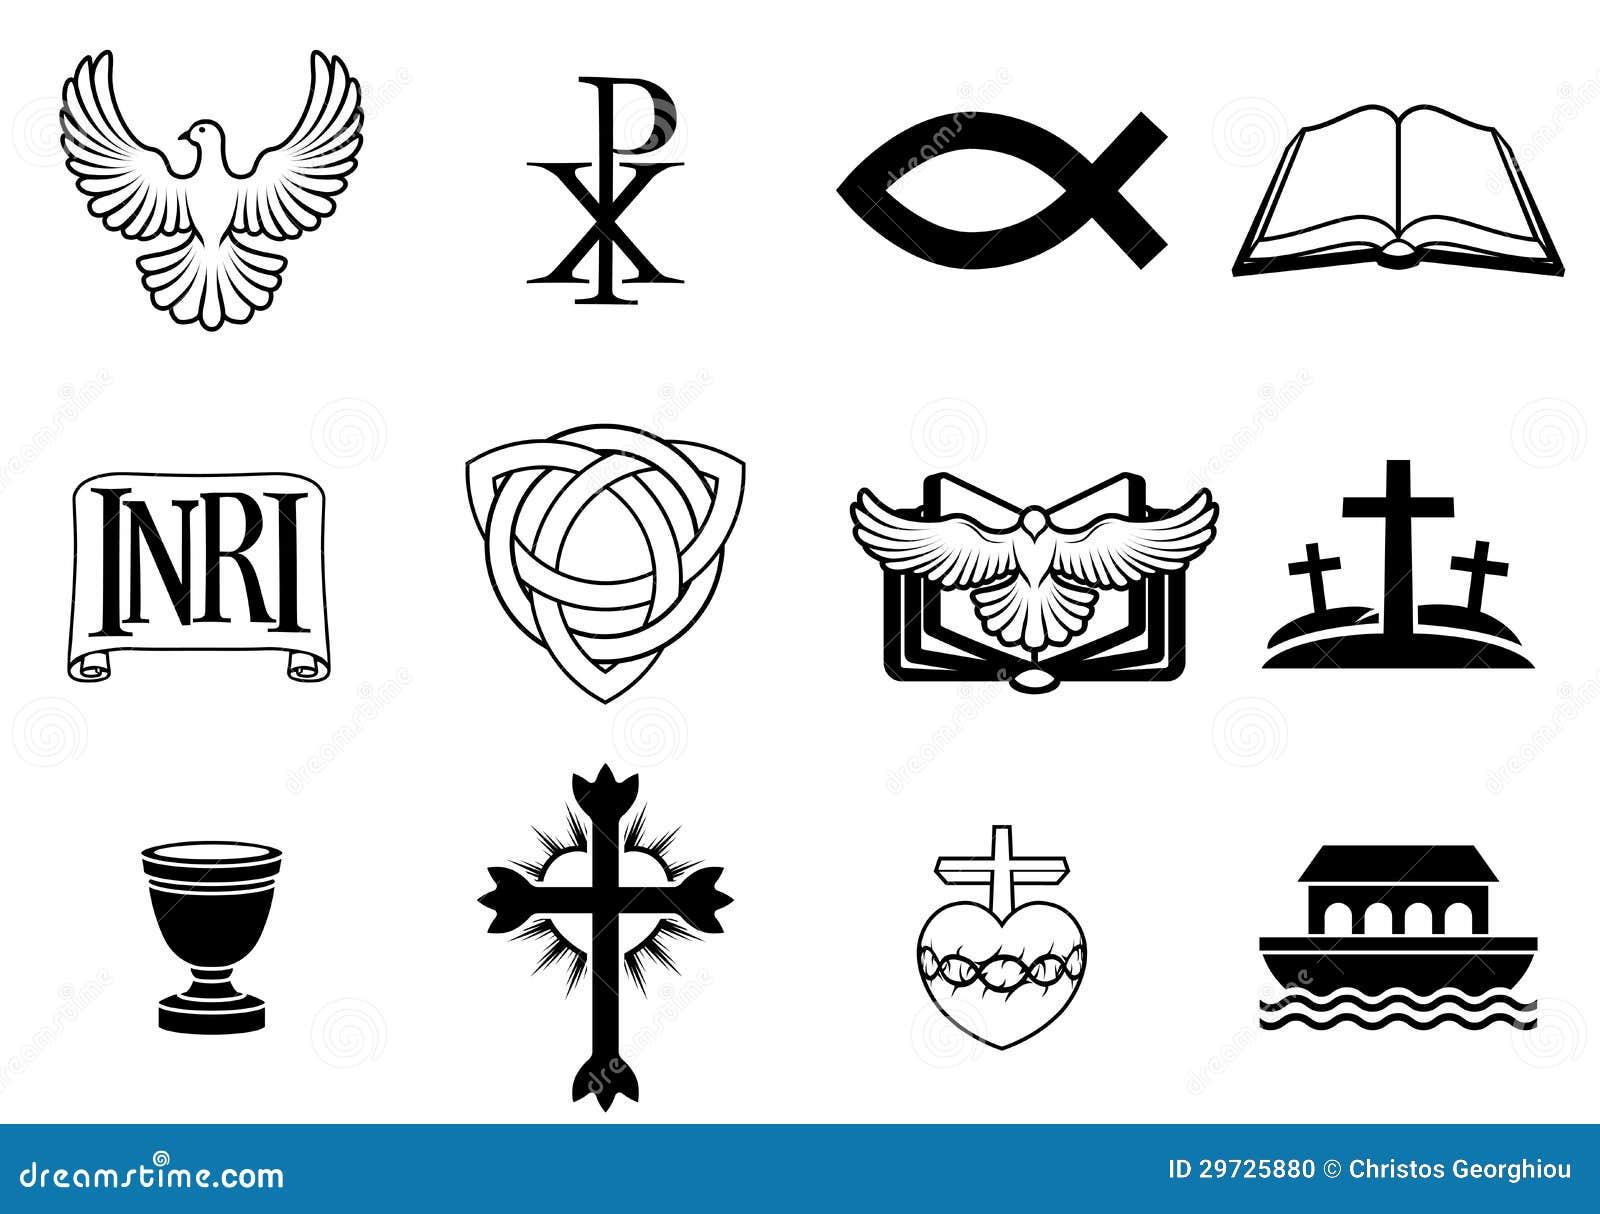 Christian prophetic symbols gallery symbol and sign ideas christian prophetic symbols gallery symbol and sign ideas christian icon set stock vector illustration of communion buycottarizona